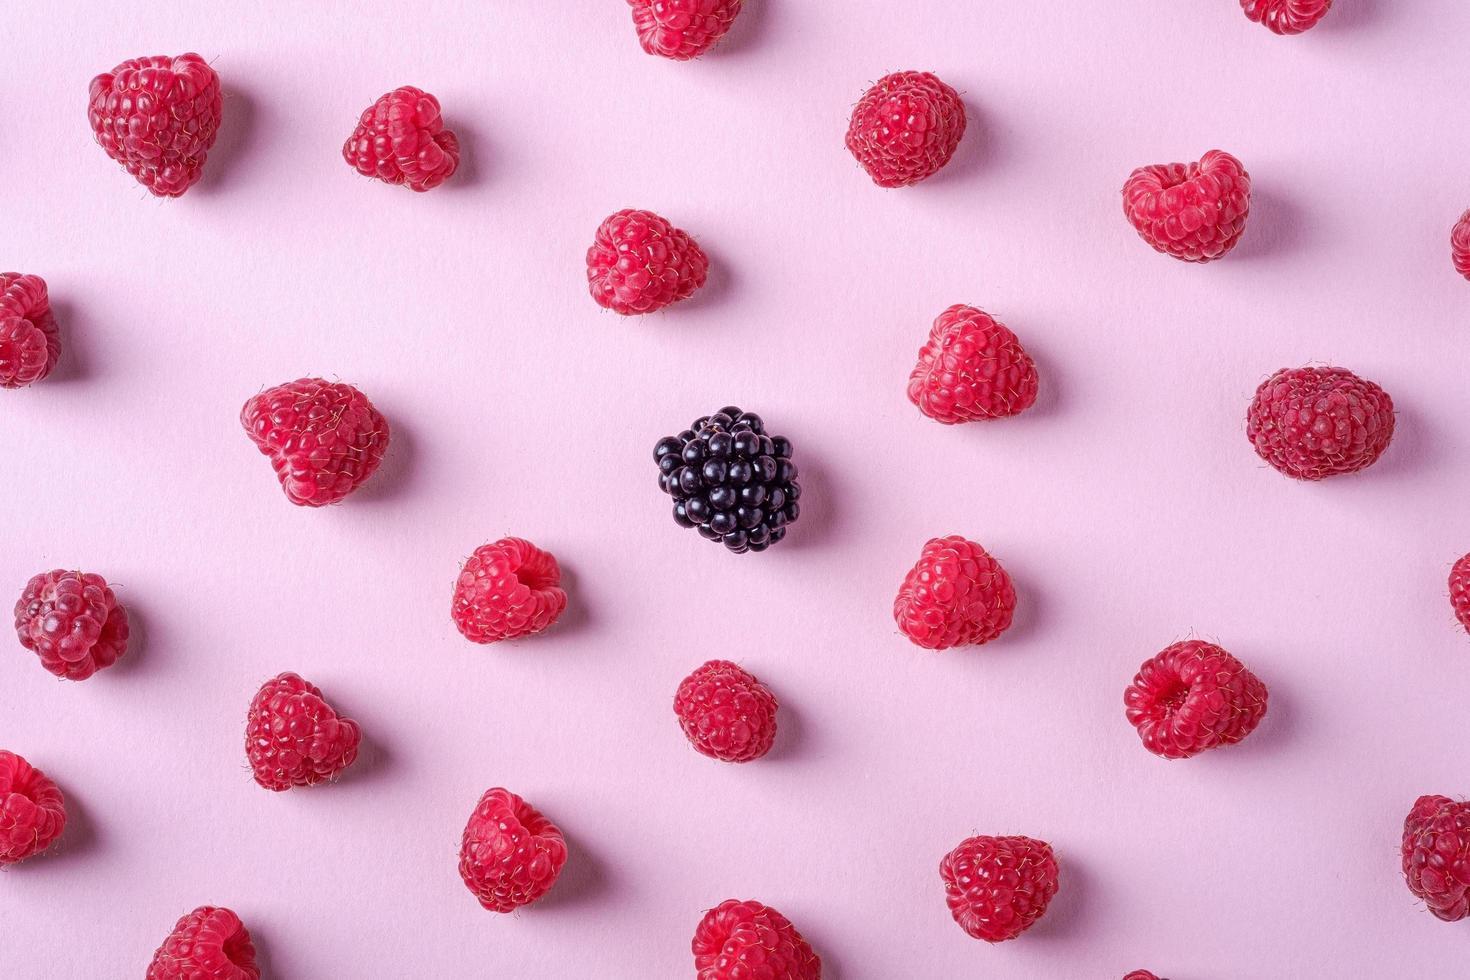 Raspberry sweet organic juicy berries with single blackberry photo